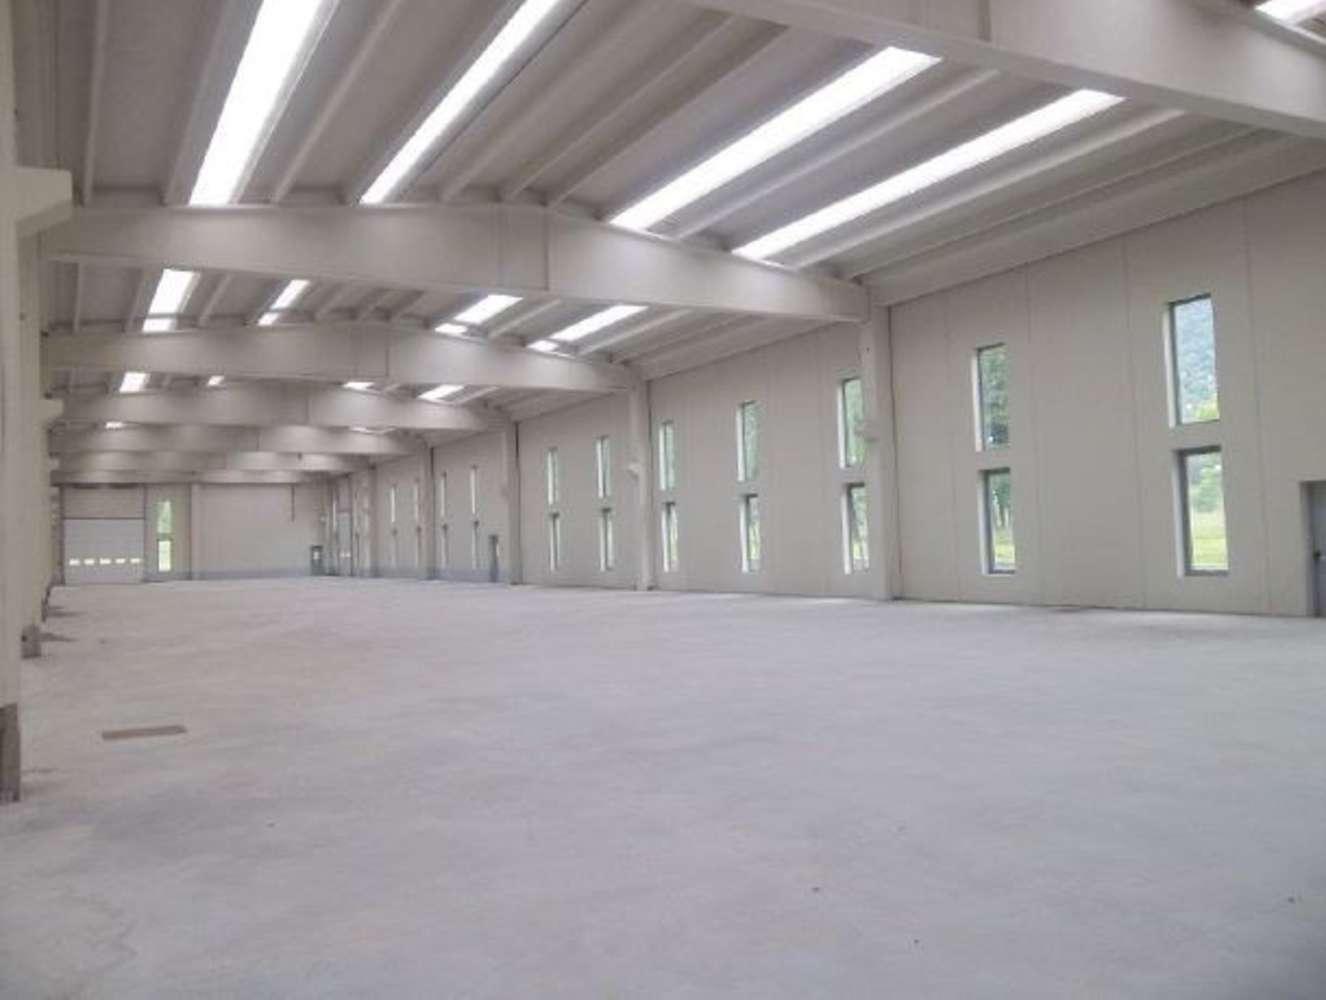 Magazzini industriali e logistici Issogne, 11020 - Capannoni logistici e uffici Aosta